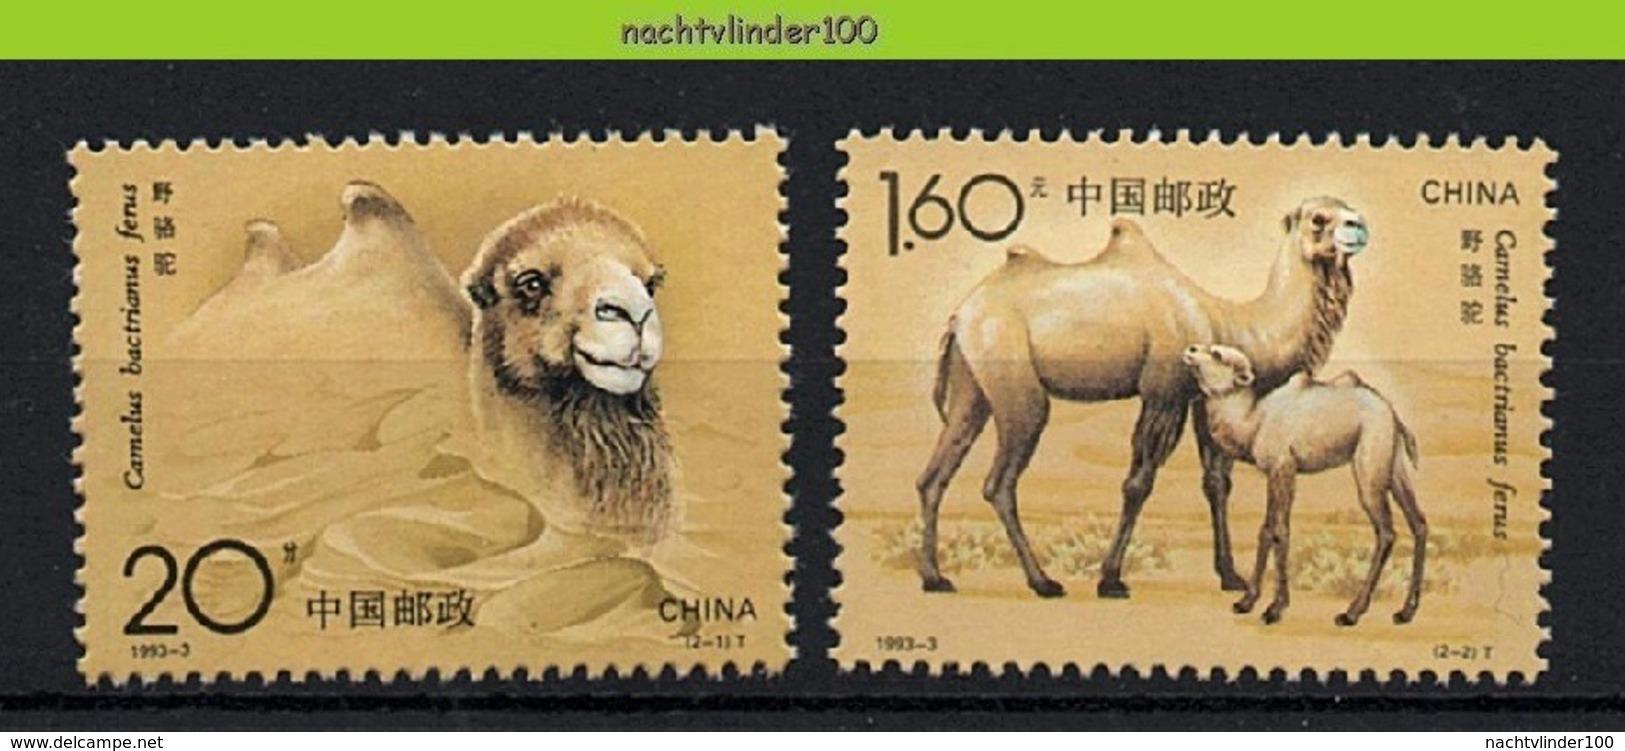 Nff116 FAUNA ZOOGDIEREN BOERDERIJDIEREN KAMEEL CAMEL MAMMALS FARM ANIMALS CHINA 1993 PF/MNH - Farm